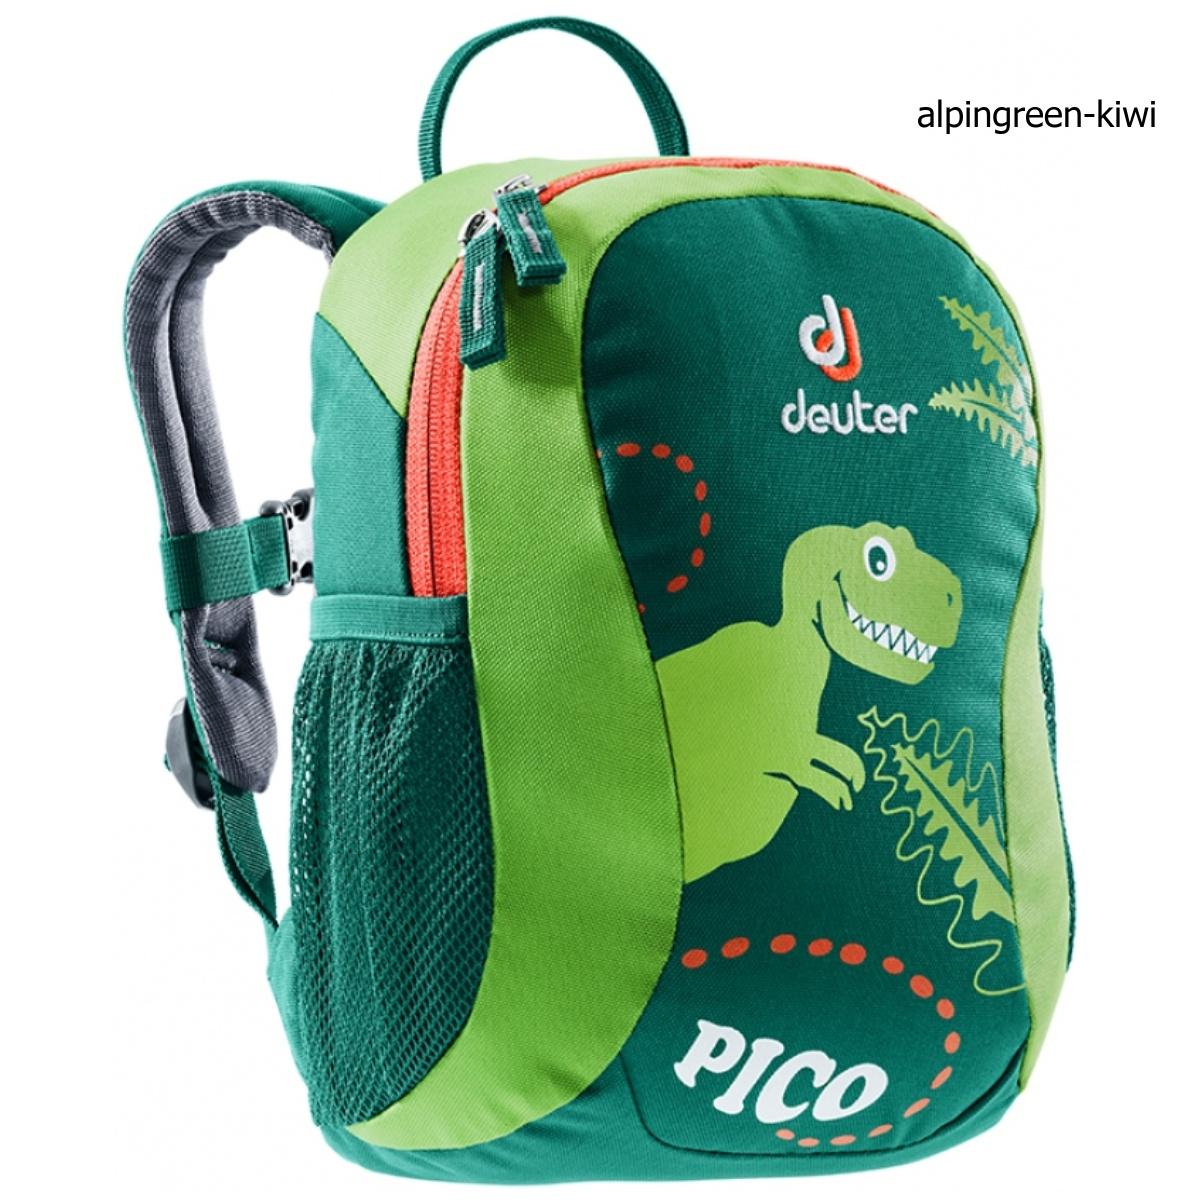 Dětský batoh DEUTER Pico 5 l - kiwi